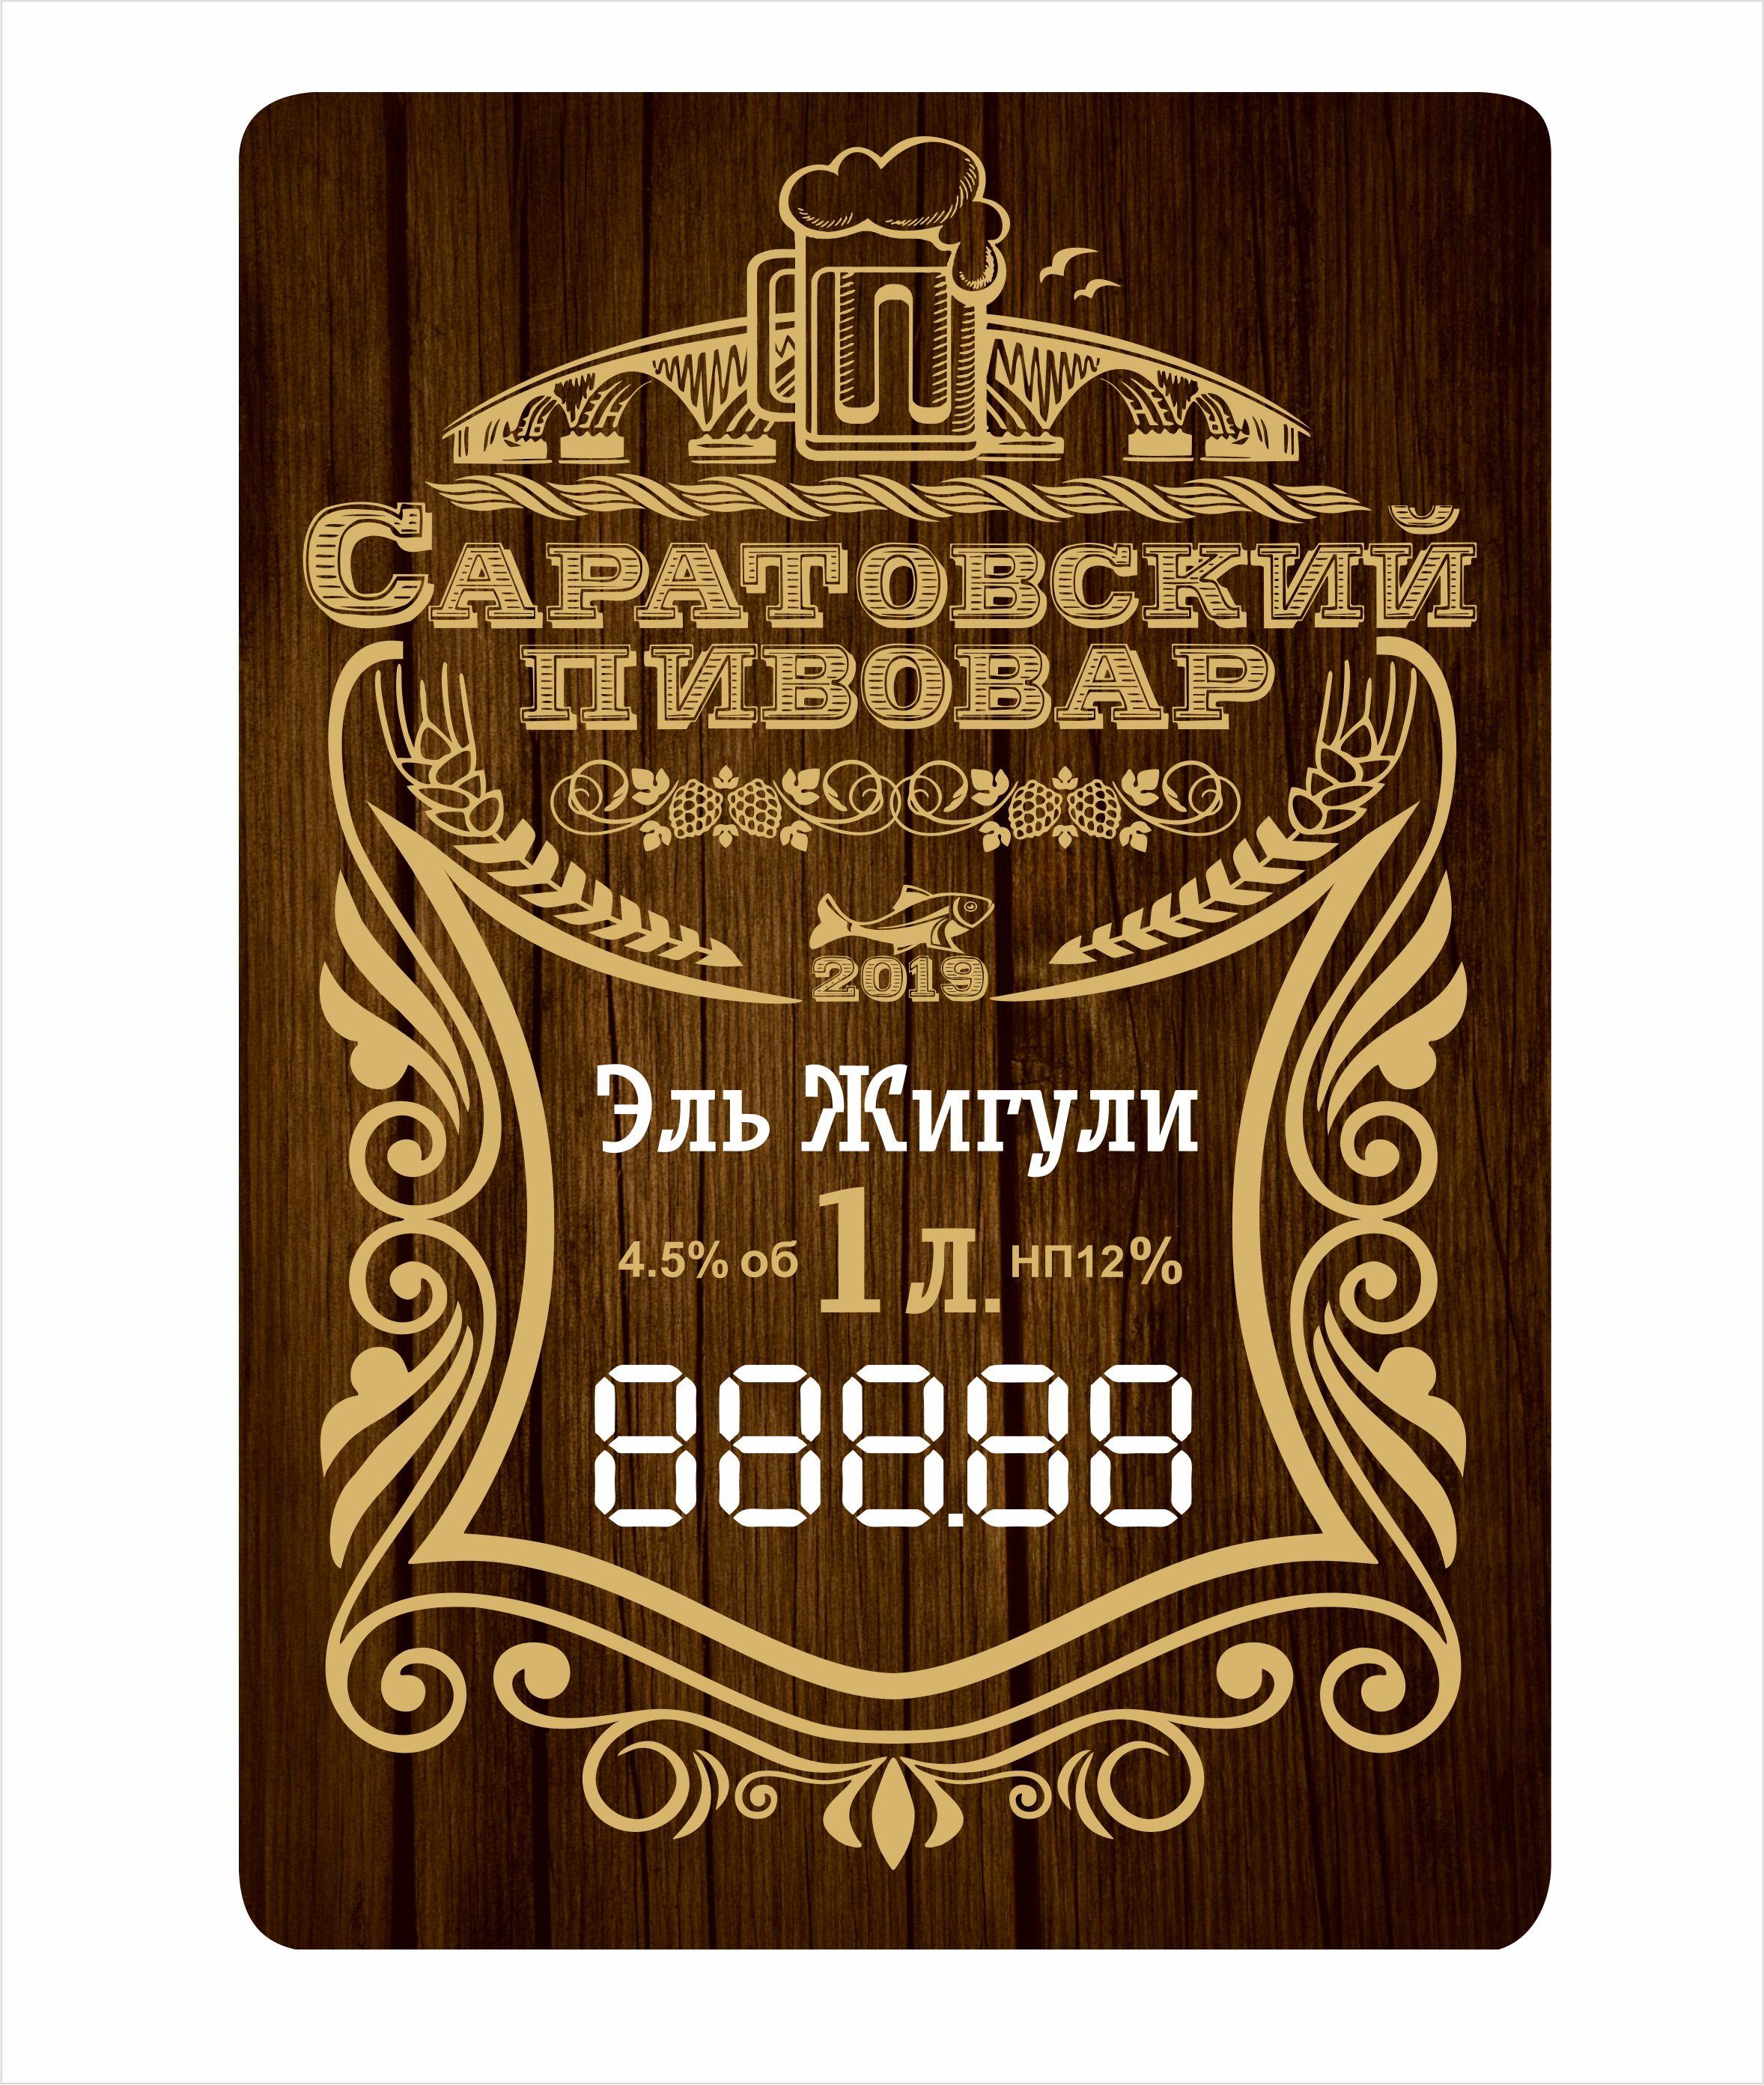 Разработка логотипа для частной пивоварни фото f_0105d7882958f4a1.jpg